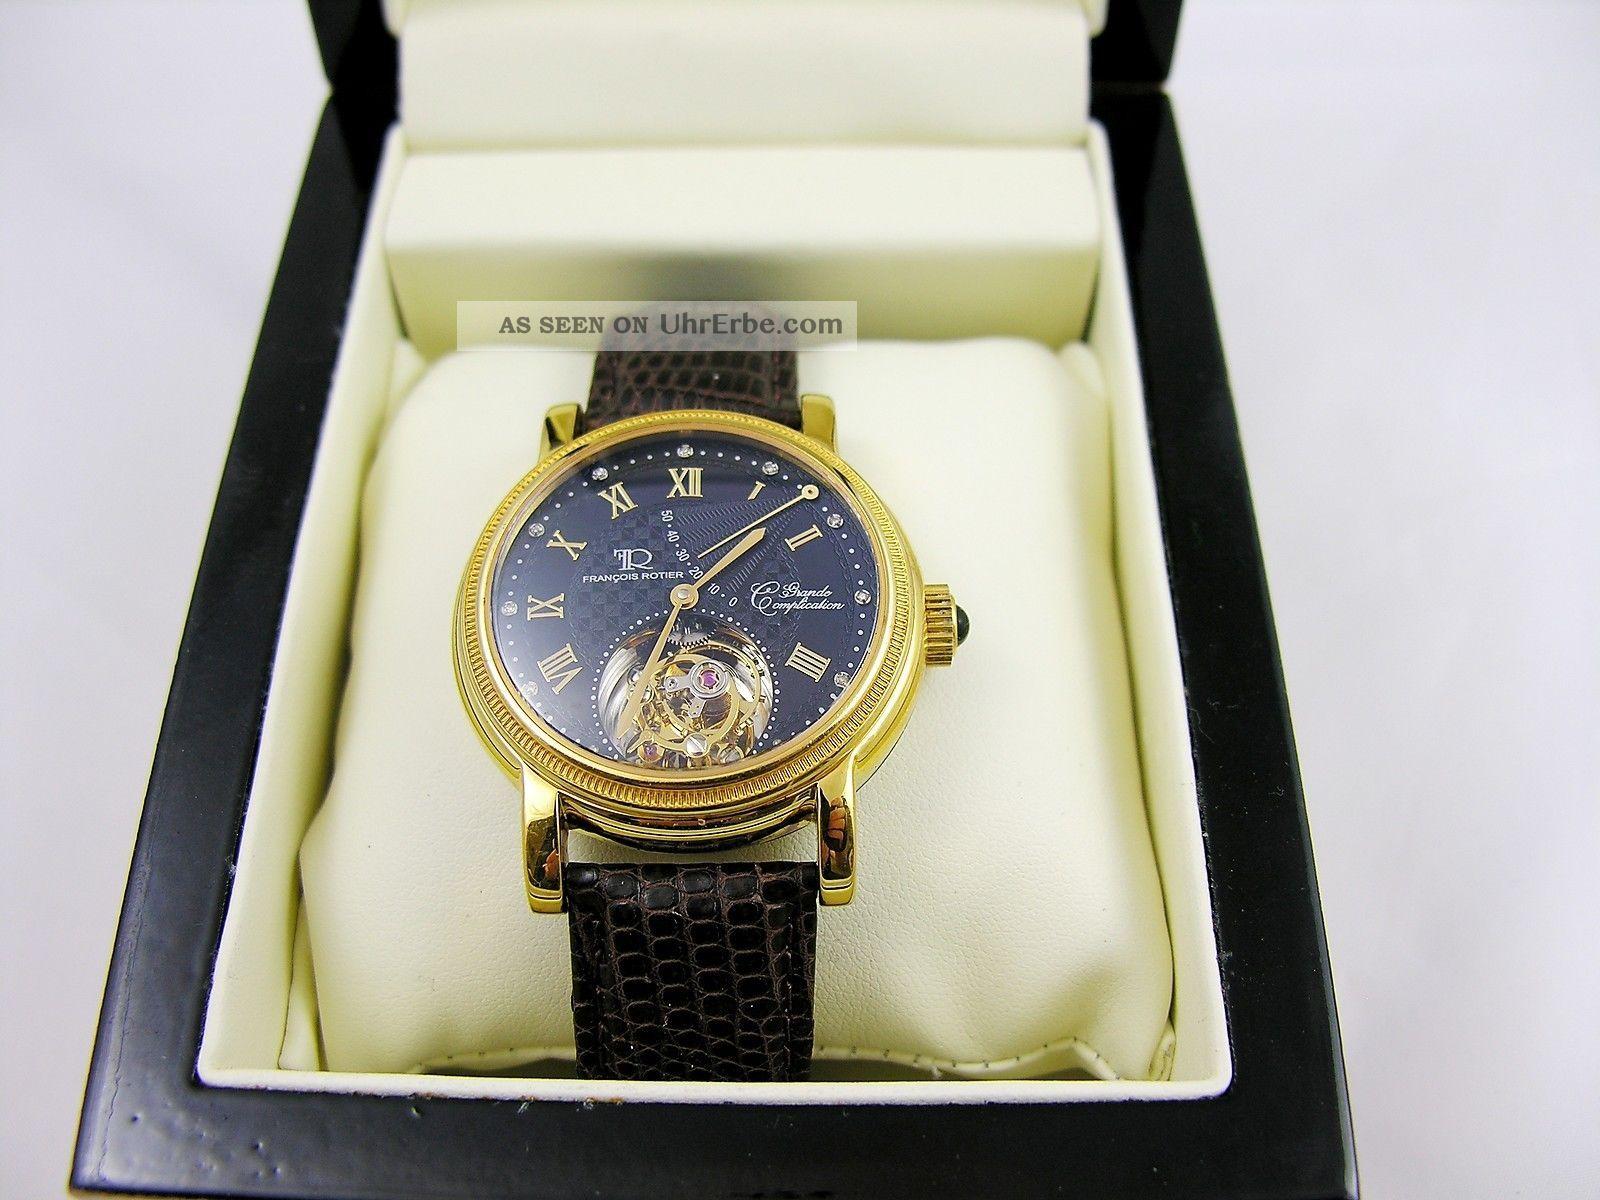 Tourbillon Regulateur Armbanduhr Herren - Luxusuhr Von Francois Rotier Armbanduhren Bild